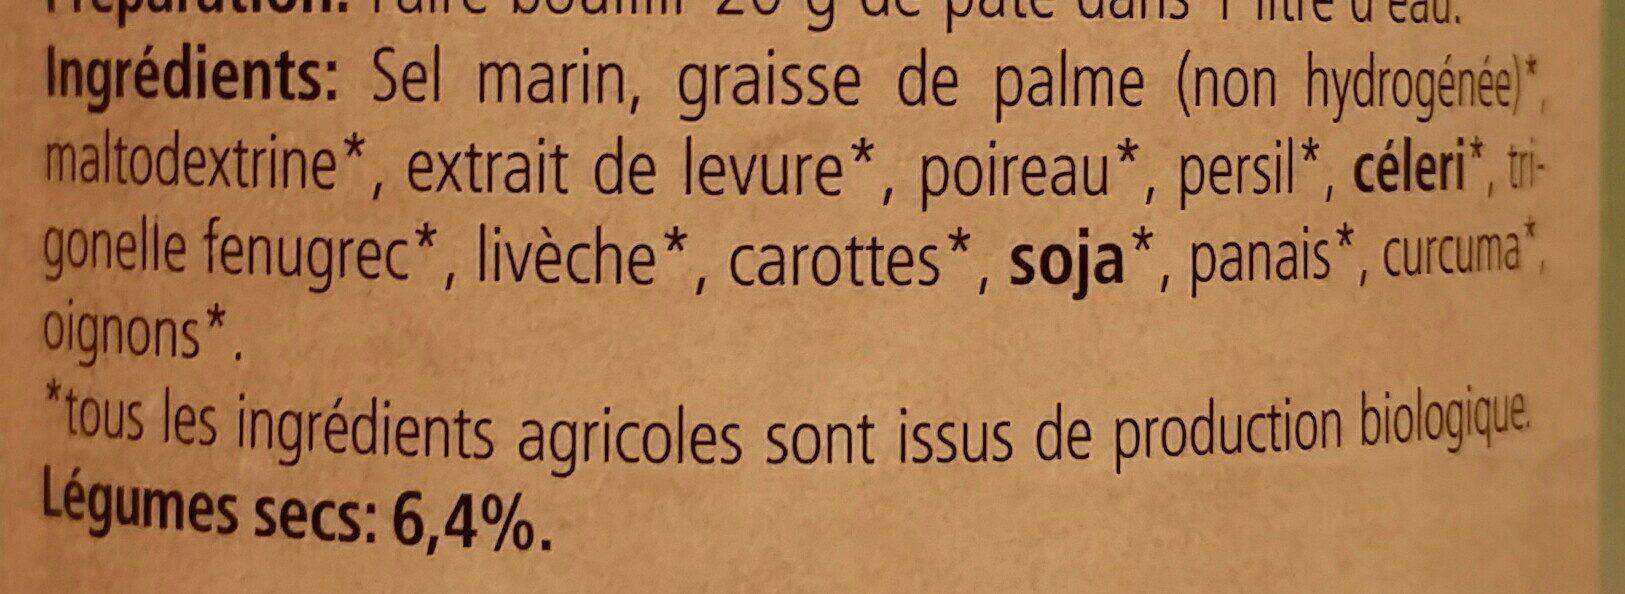 Bouillon Vegetal Legume Pate SG 400G - Ingrédients - fr